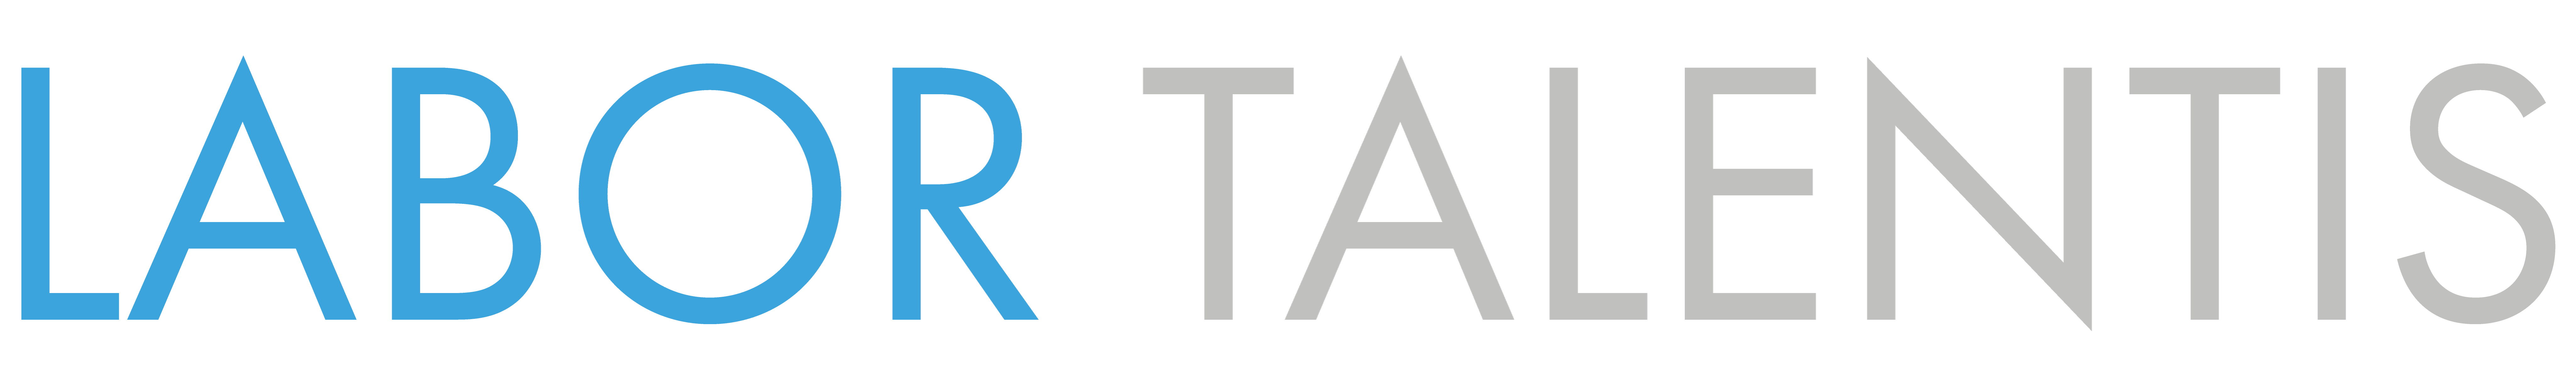 LaborTalentis